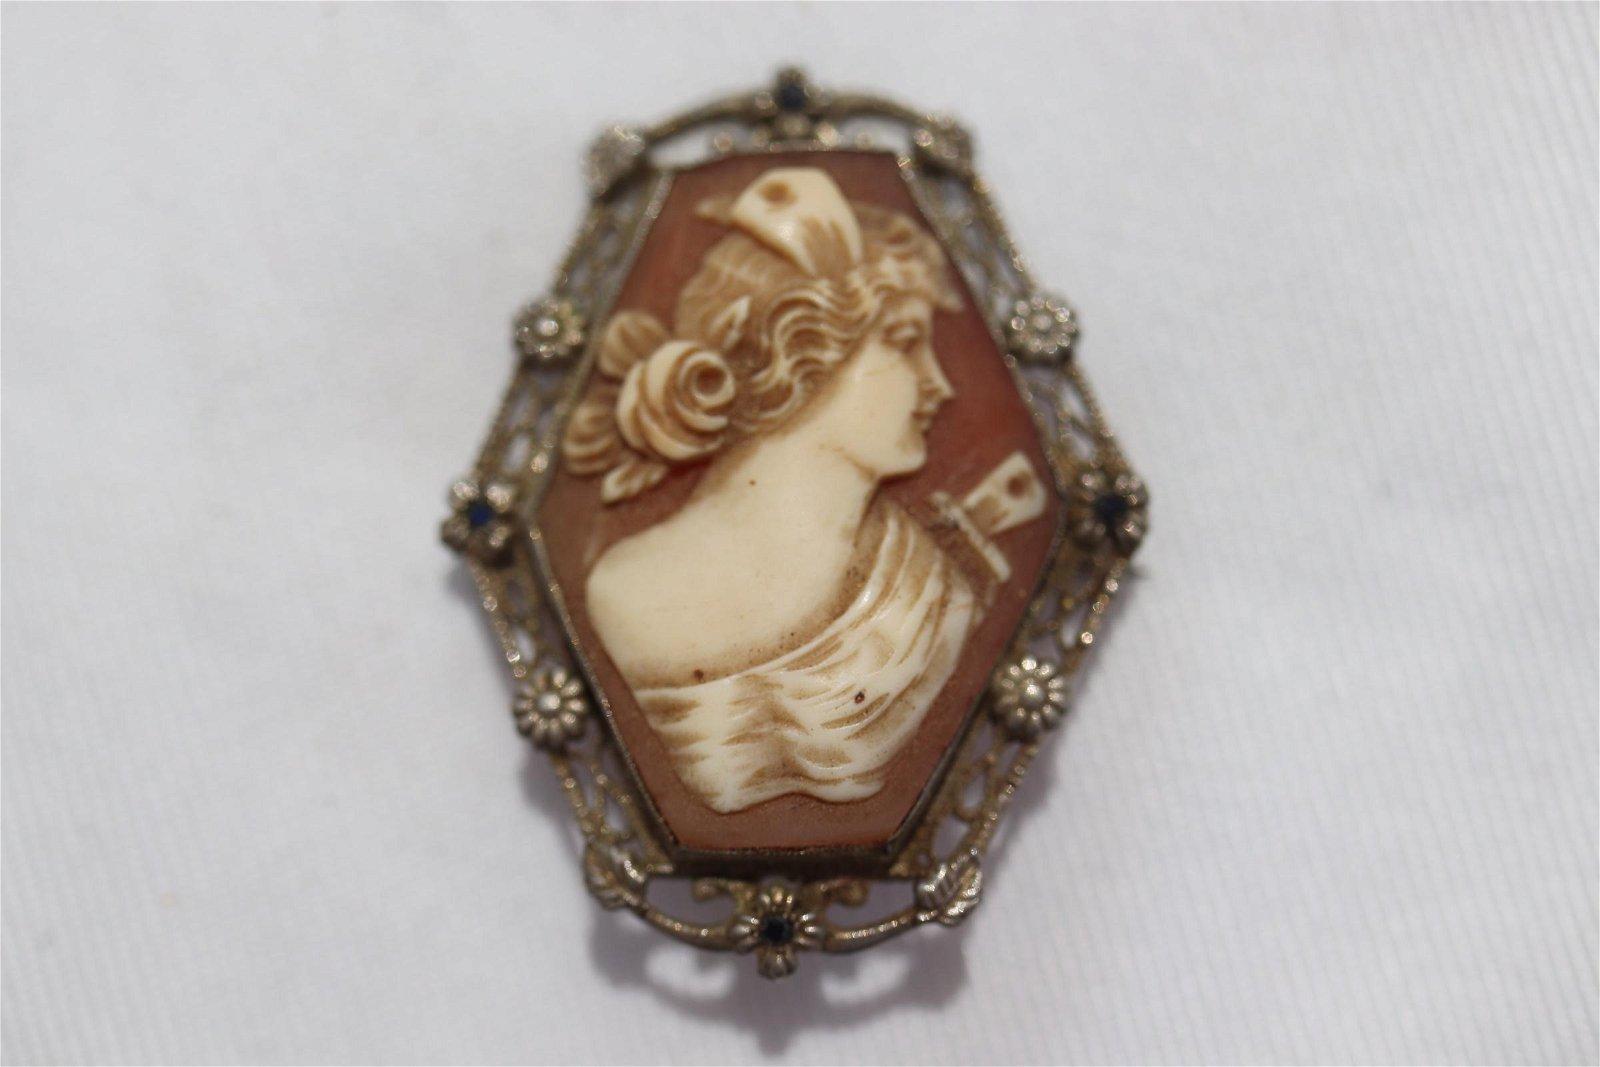 Antique Art Nouveau Cameo Brooch with Sapphire